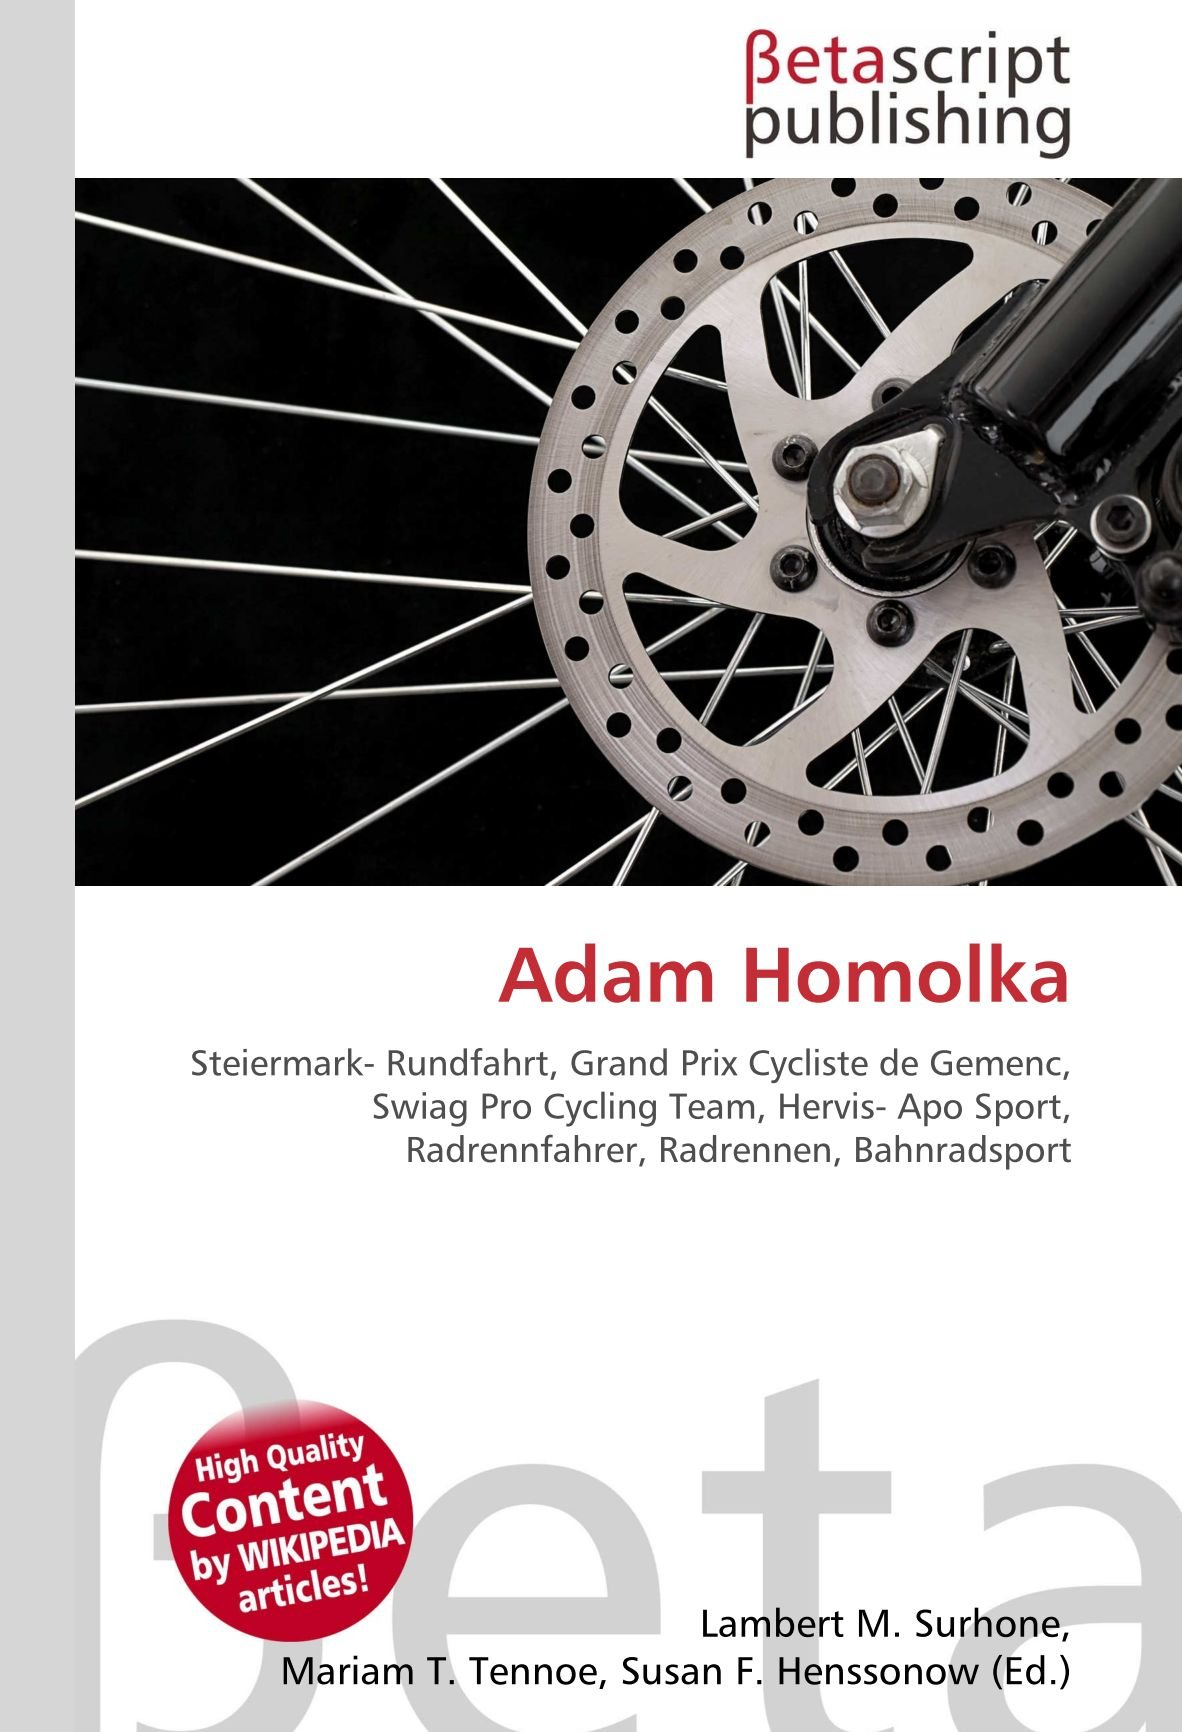 Adam Homolka: Steiermark- Rundfahrt, Grand Prix Cycliste de Gemenc ...